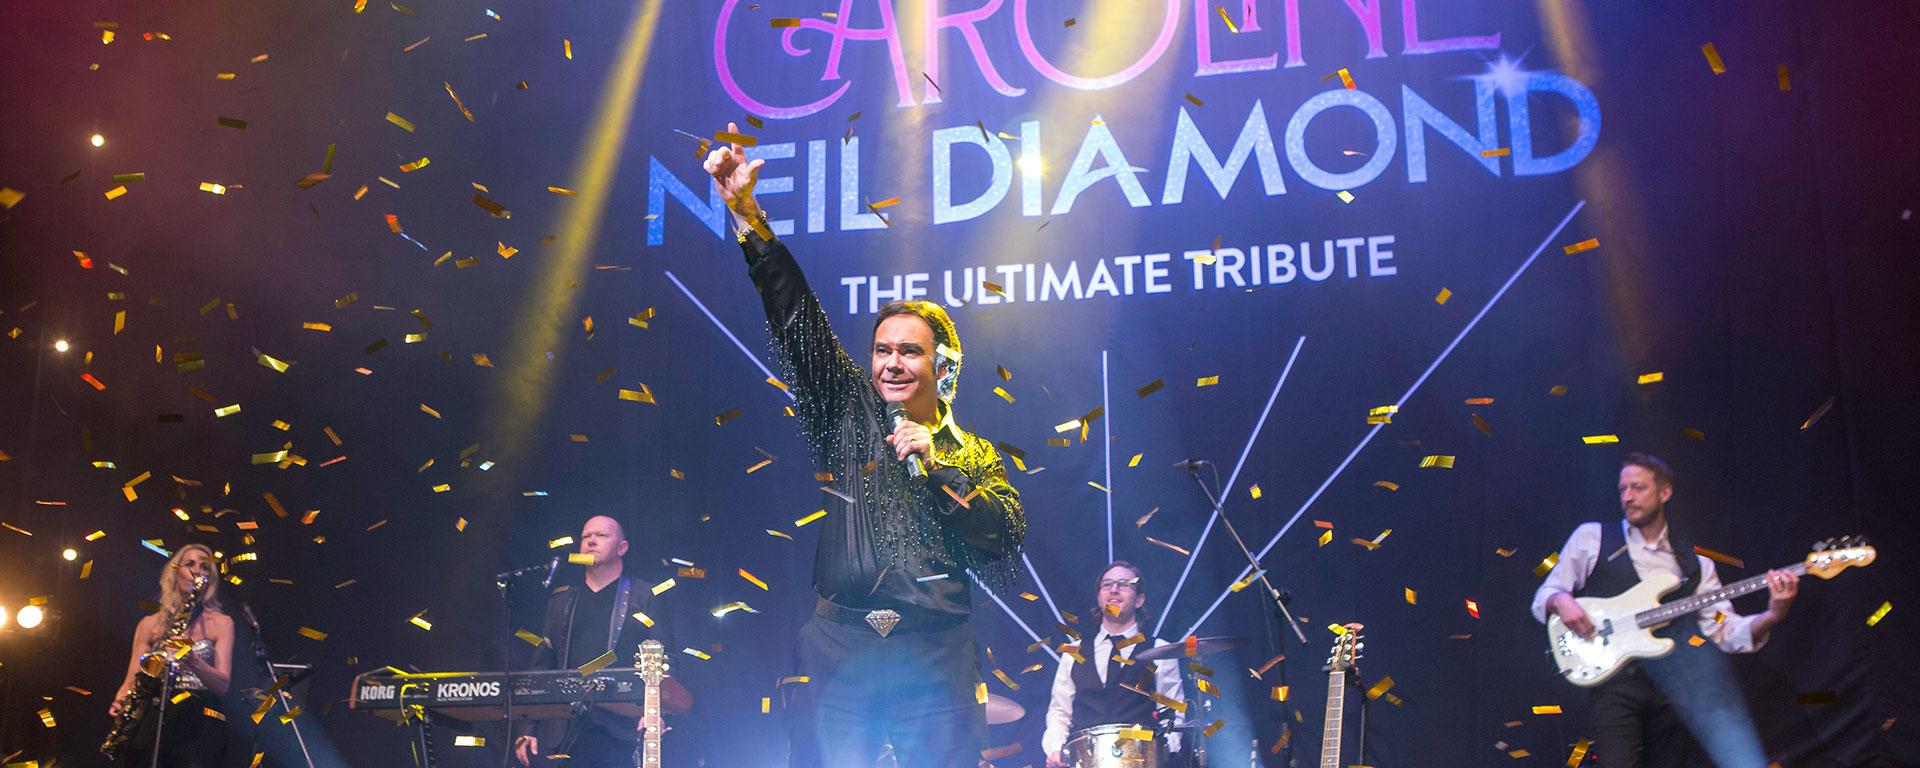 Sweet Caroline - The Ultimate Tribute to Neil Diamond